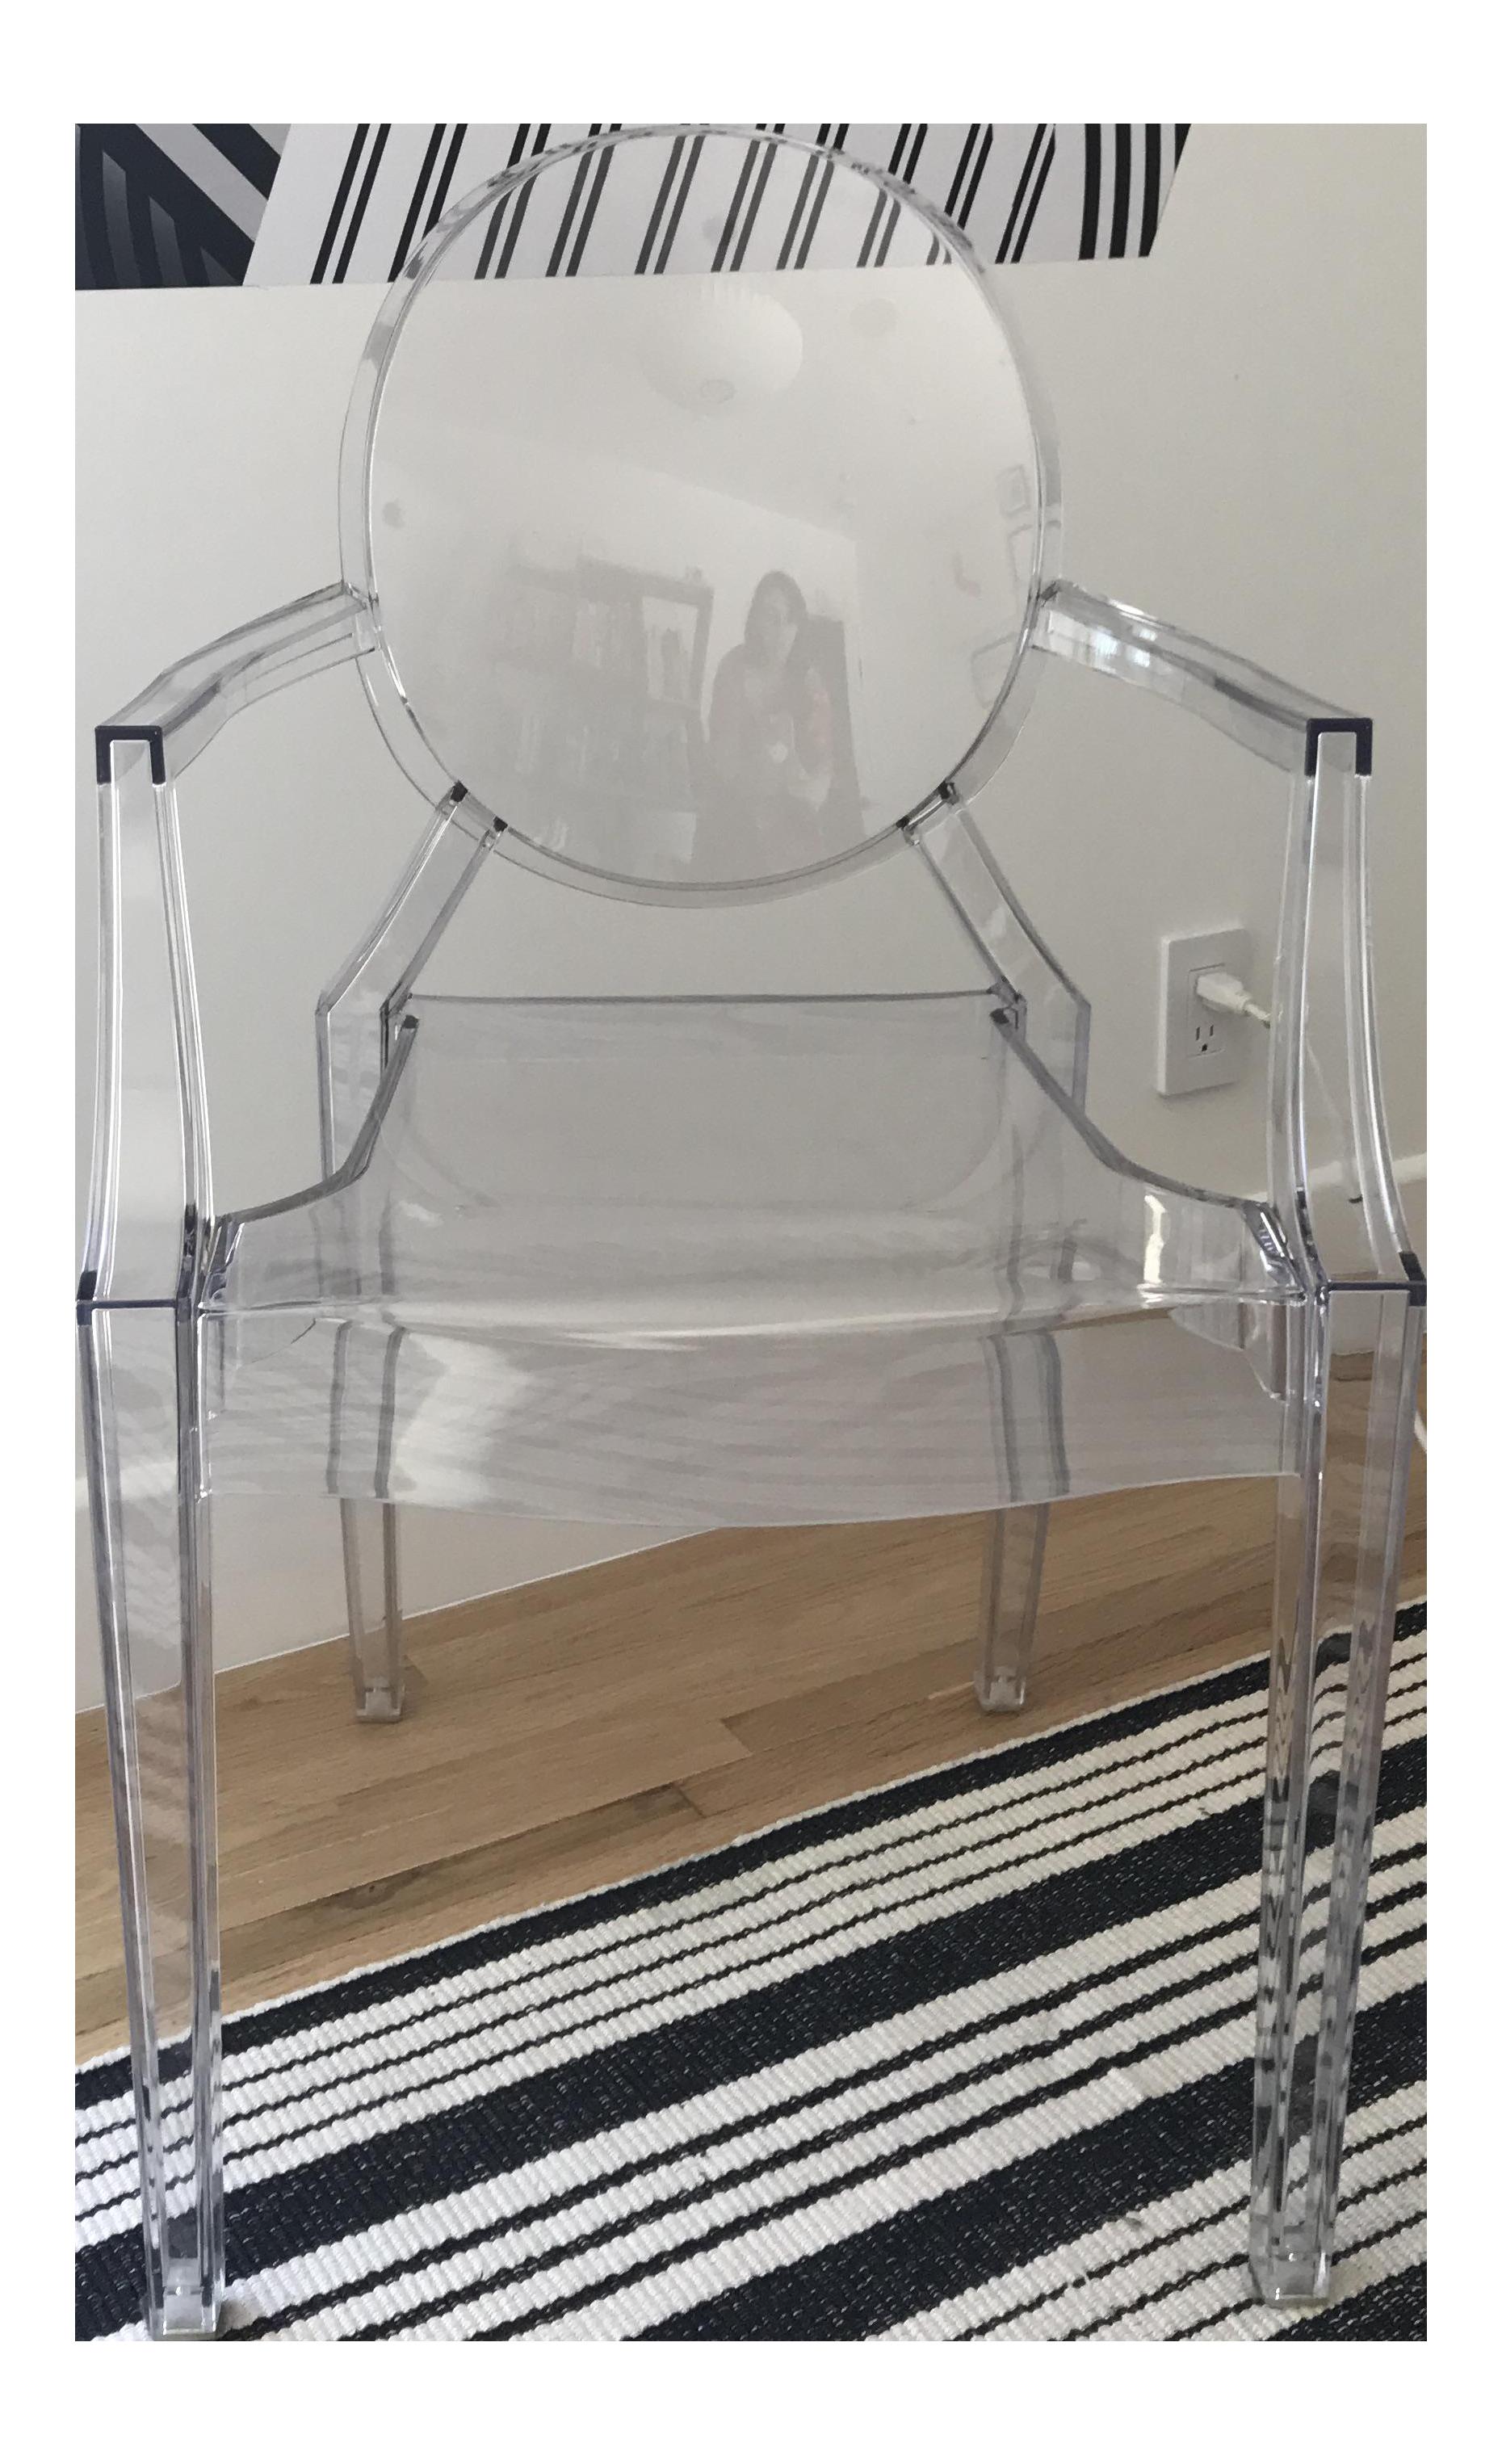 modo pin paonazza marble detailing kitchen victorian chandelier chevron starck ghost chair parquet panelled